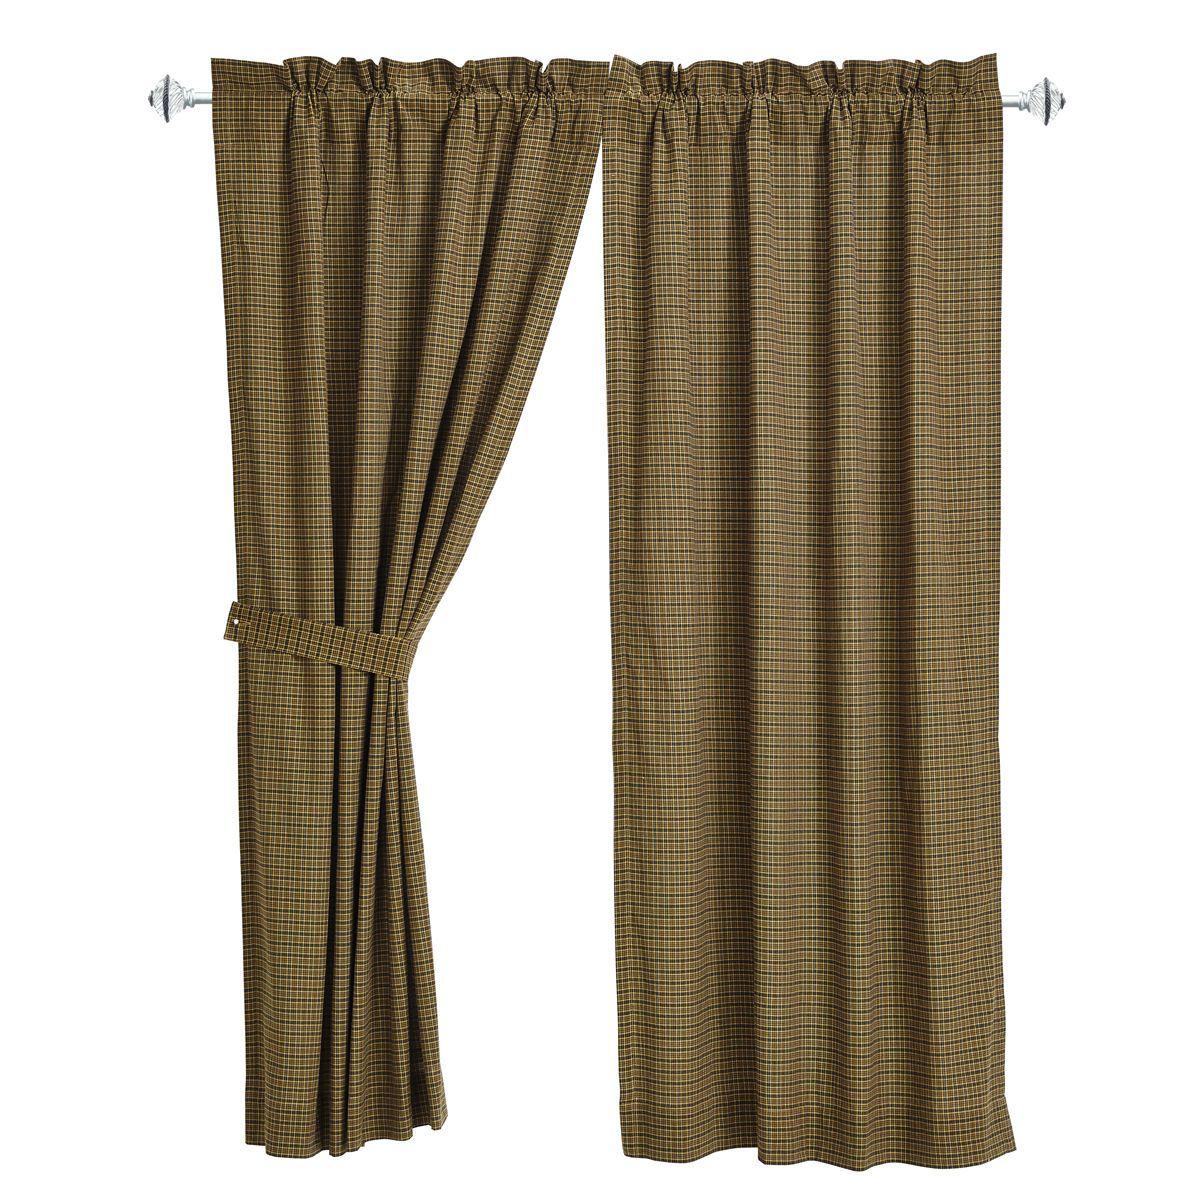 Tea Cabin - Green Plaid - Short Panels (Set of 2) - 63x36 - Window Treatment